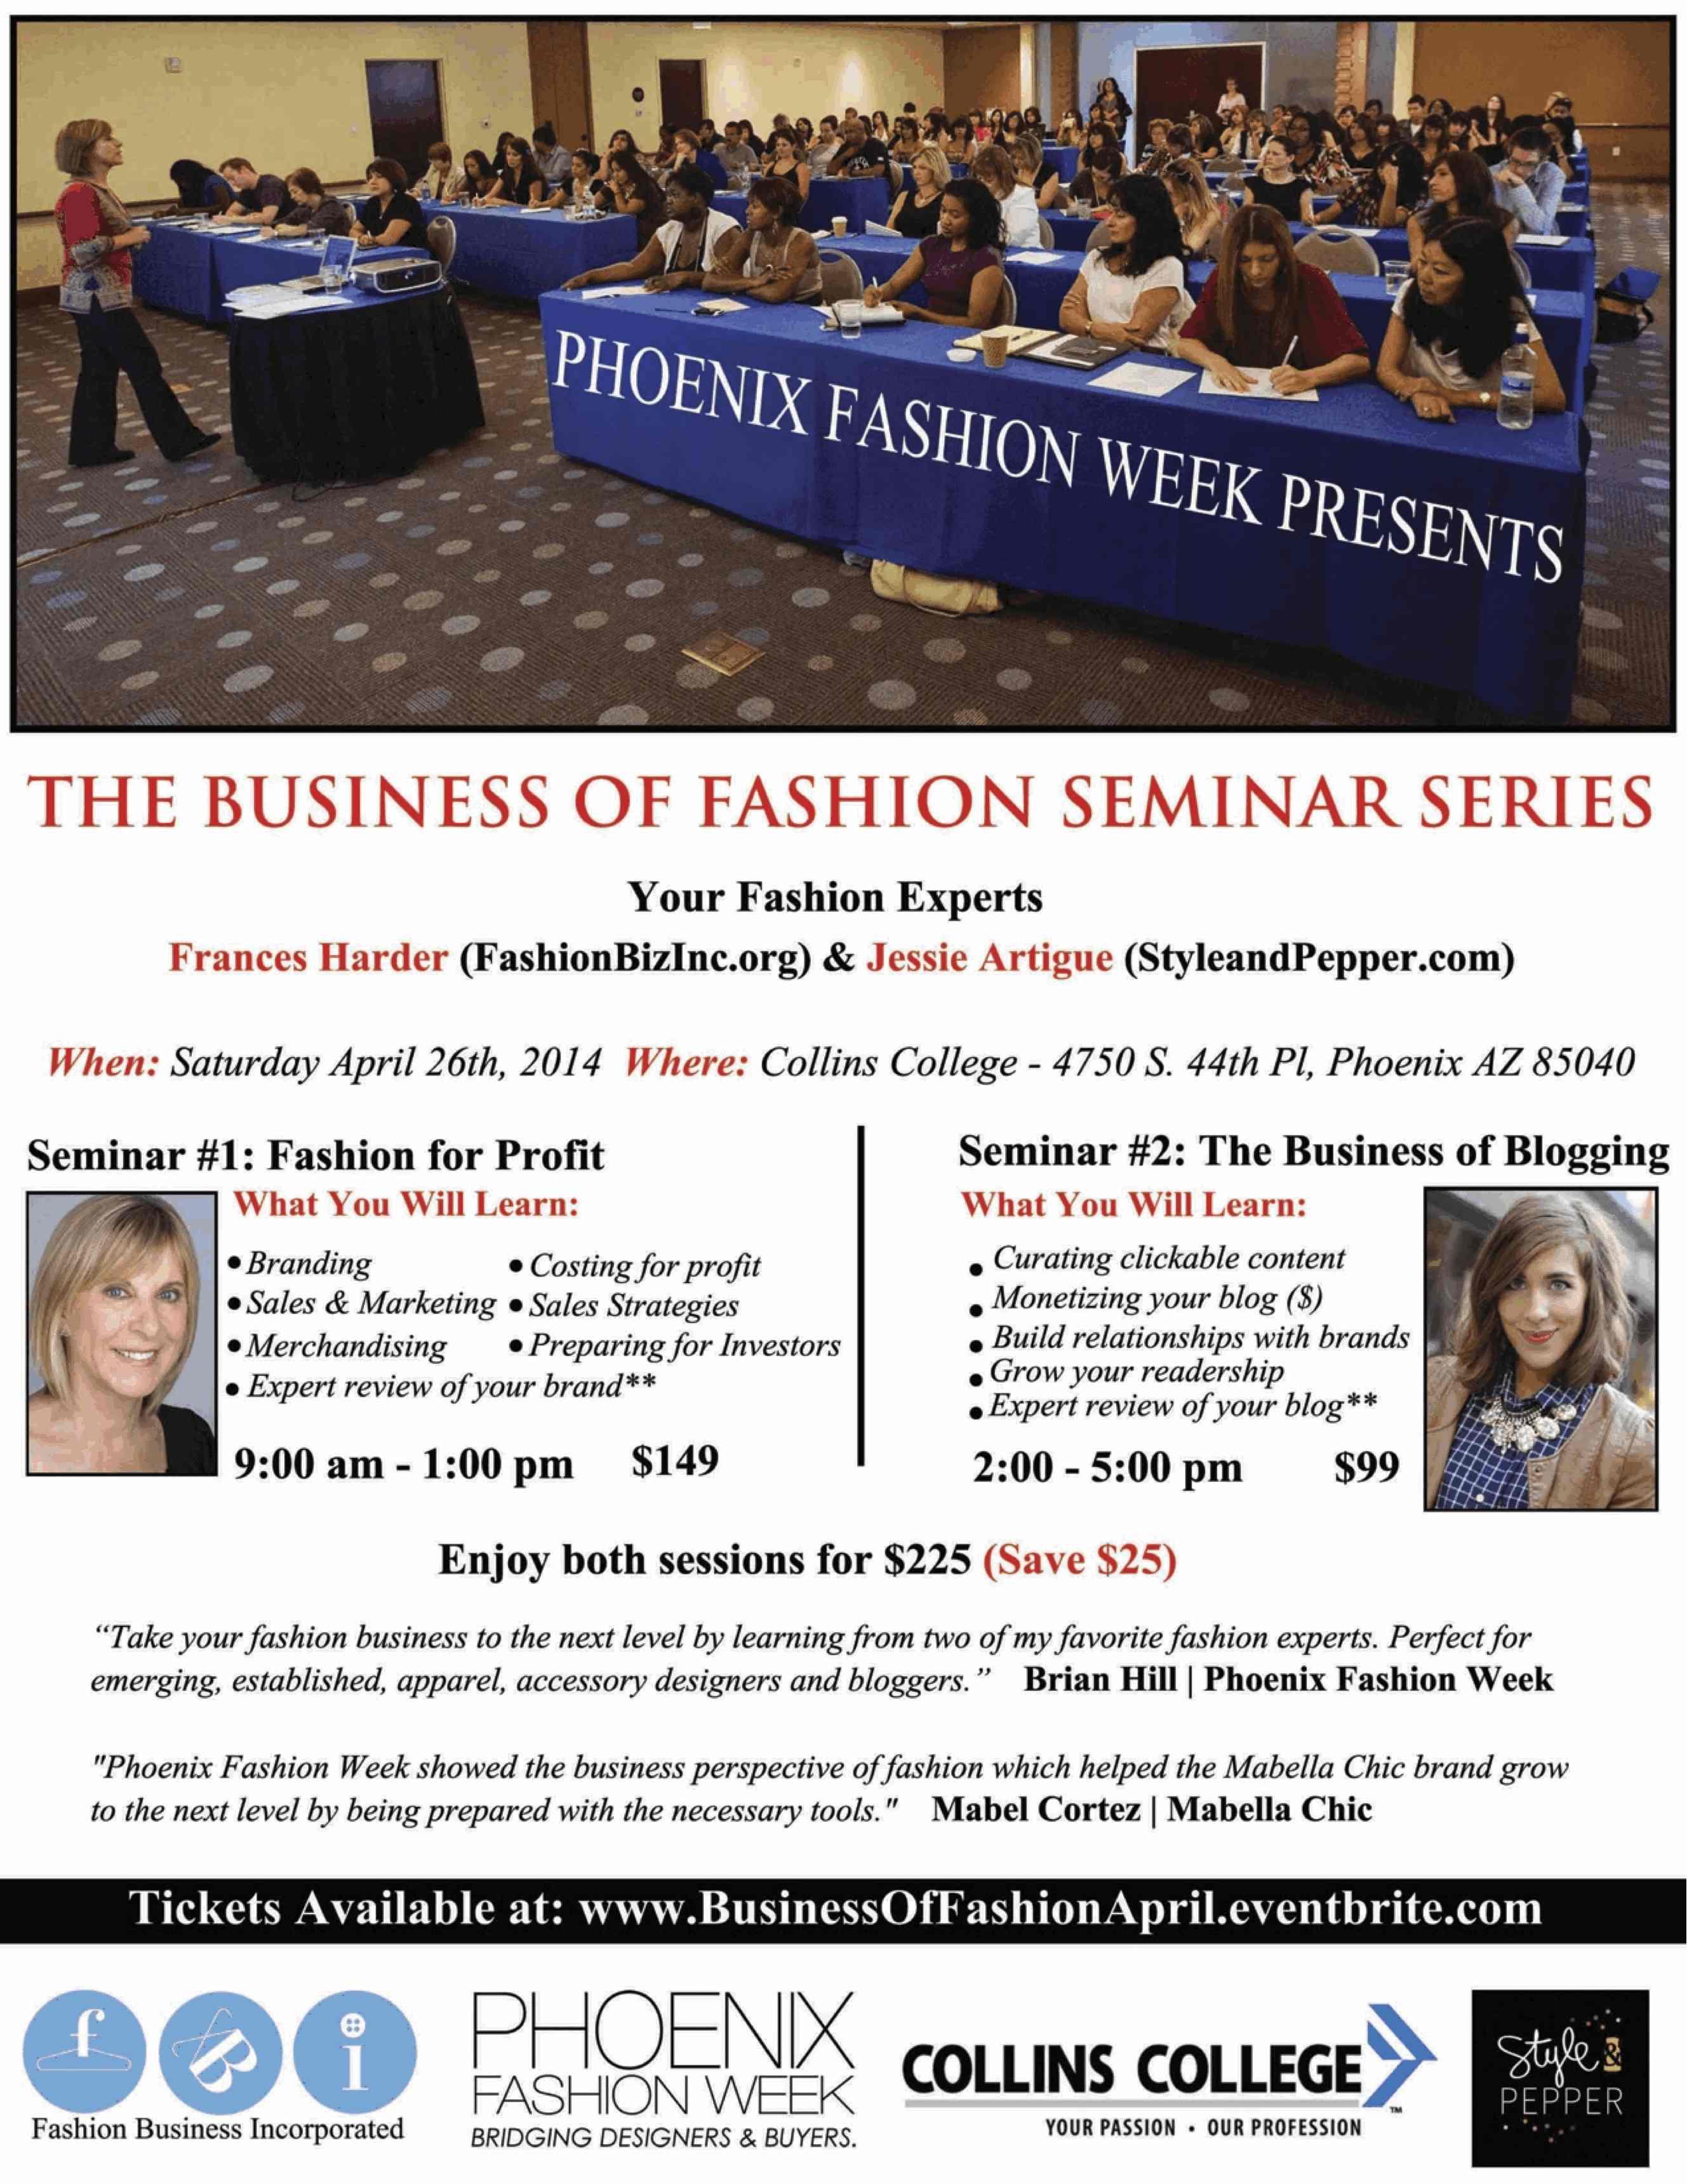 Business of Fashion Seminar Series Invitation